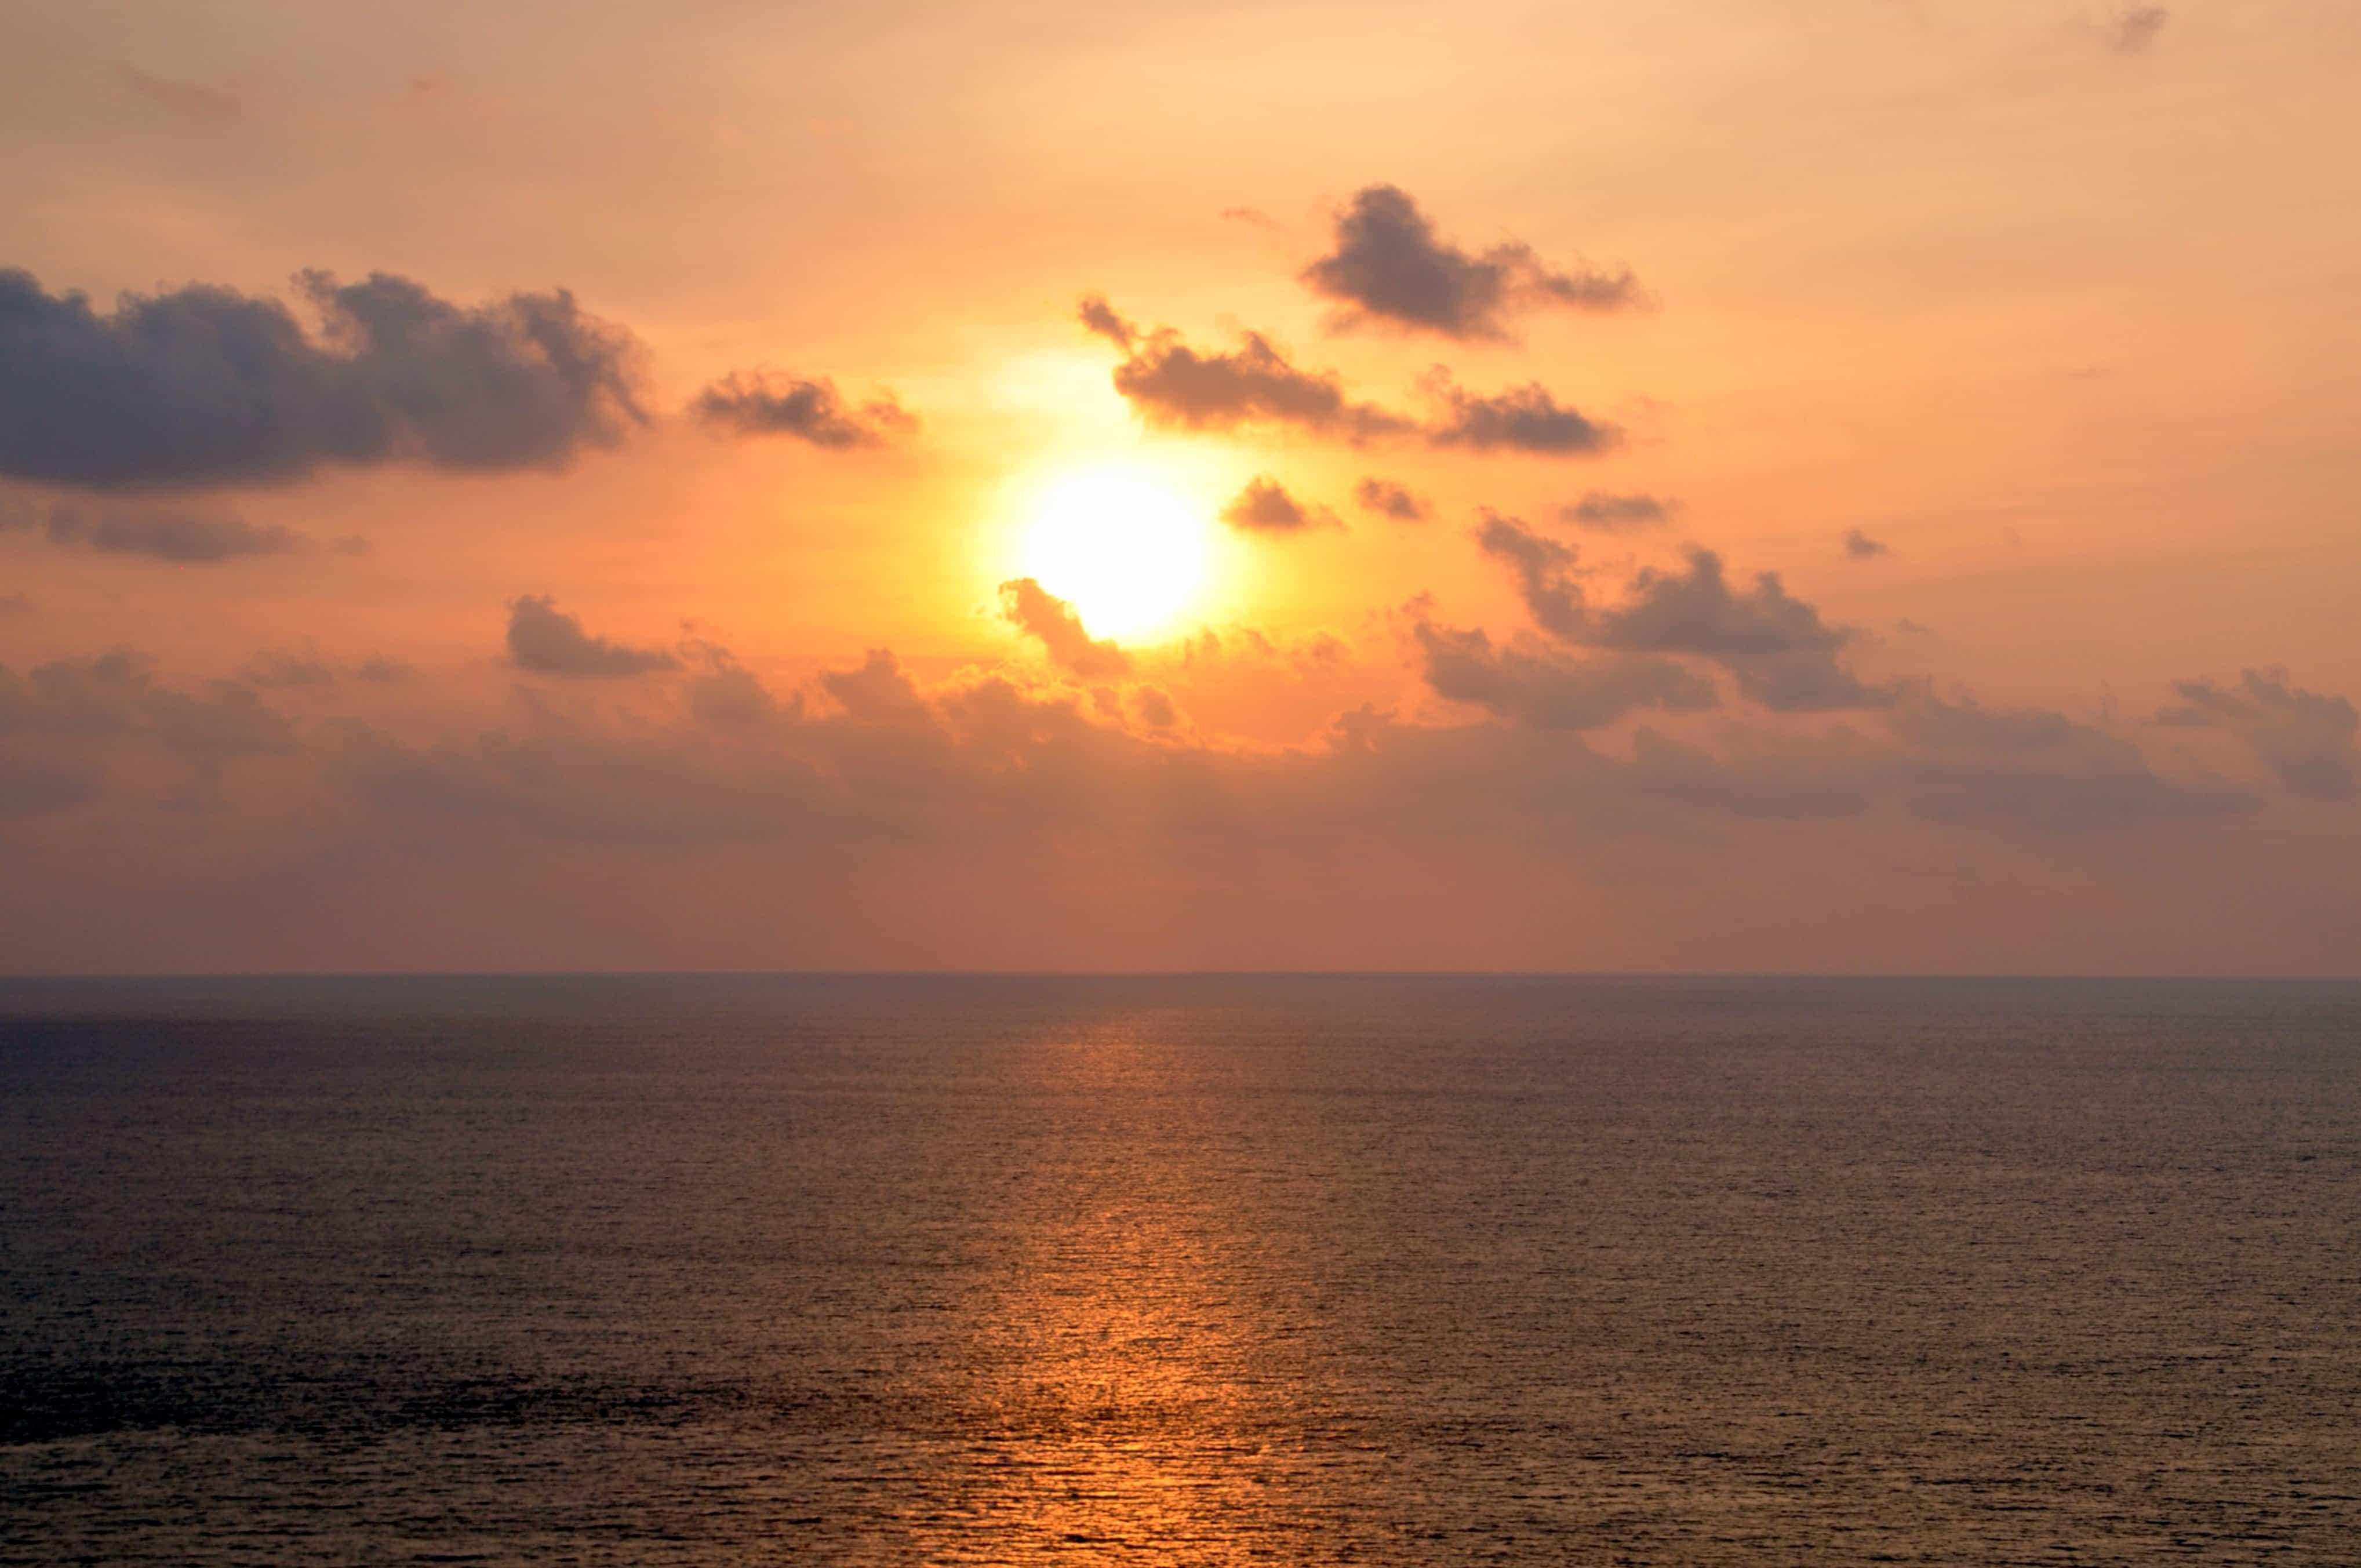 Iphone Wallpaper Cloud Free Picture Sunrise Sunlight Dawn Sun Water Sea